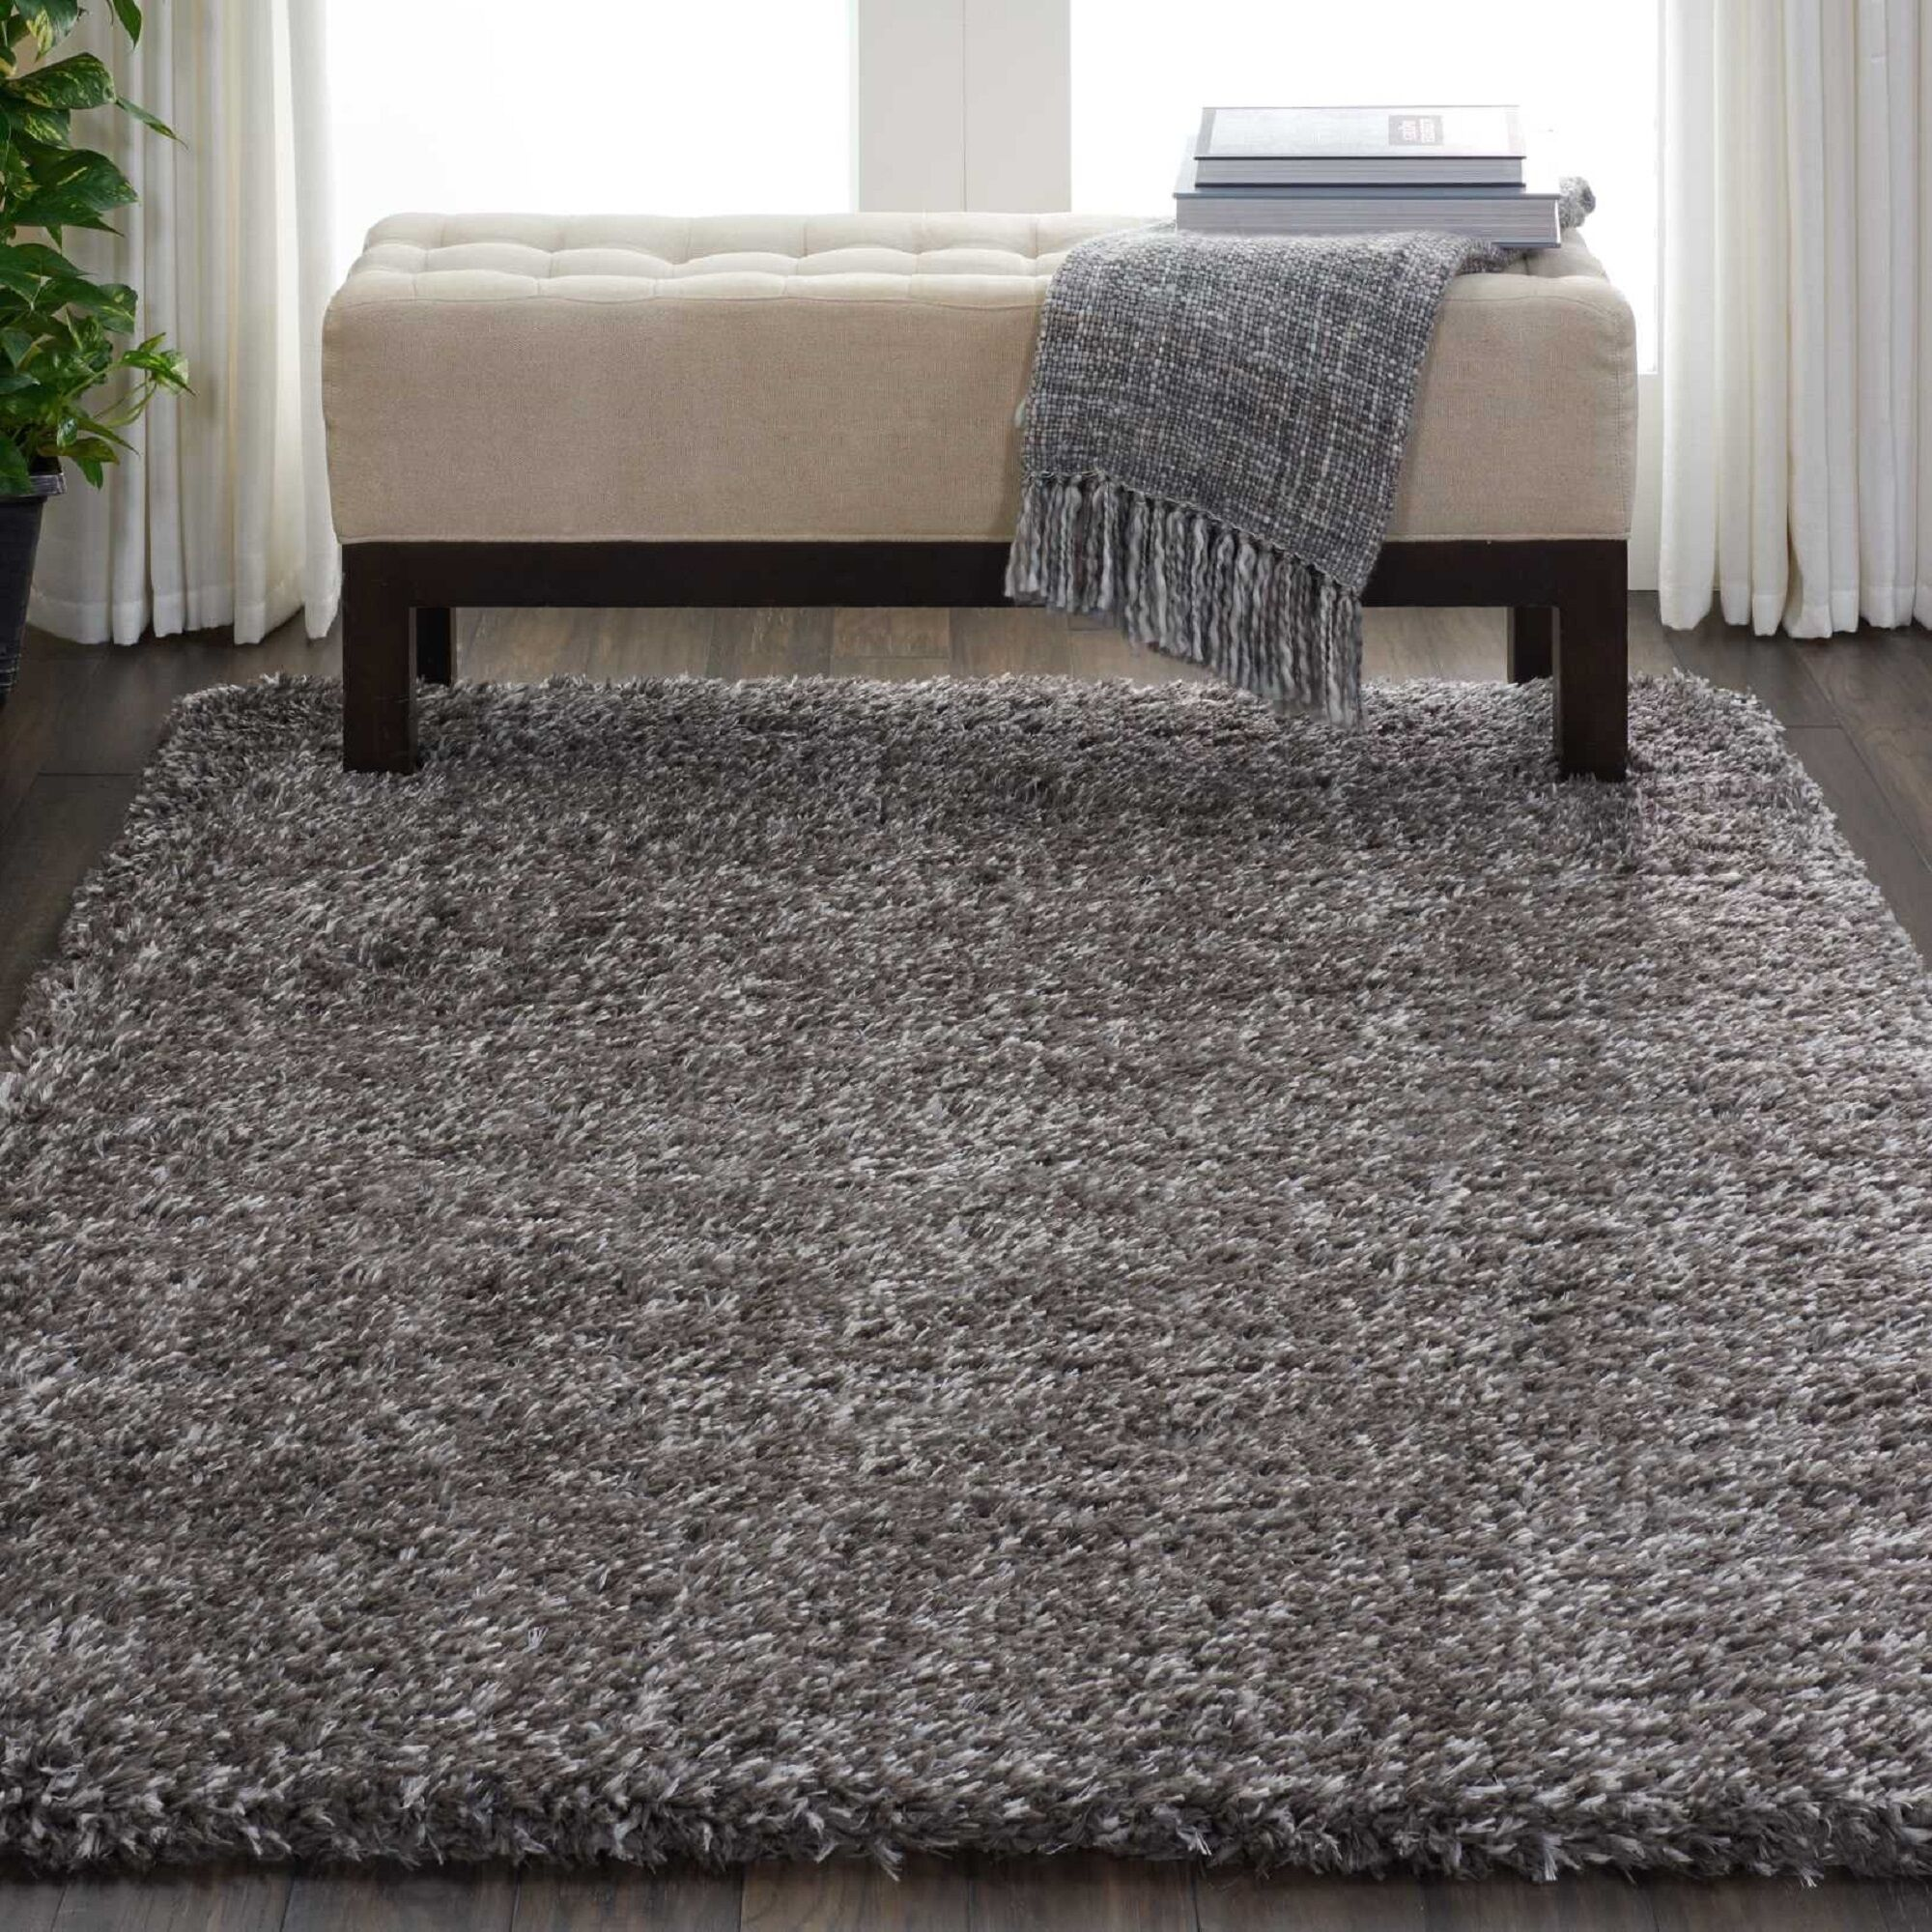 Chattahoochee Modern Solid Charcoal Grey Area Rug Rug Size: Rectangle 4' x 6'